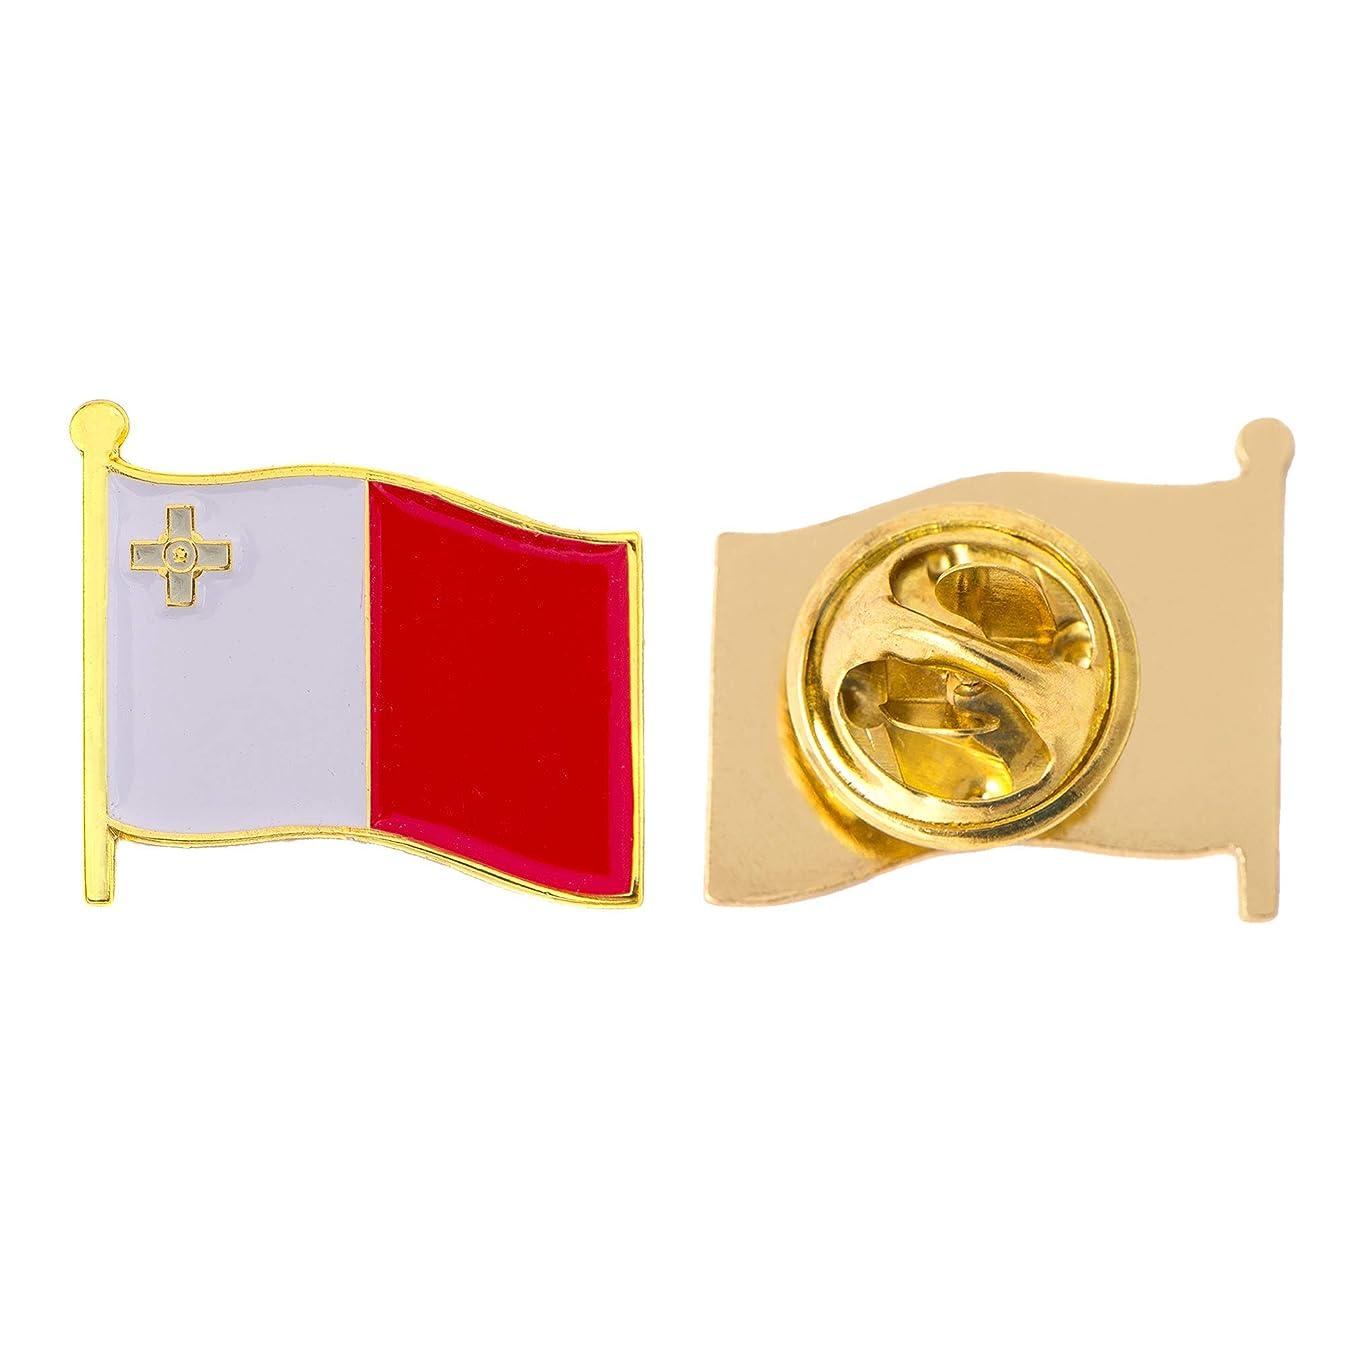 Malta Country Flag Lapel Pin Enamel Made of Metal Souvenir Hat Men Women Patriotic (Waving Flag Lapel Pin)